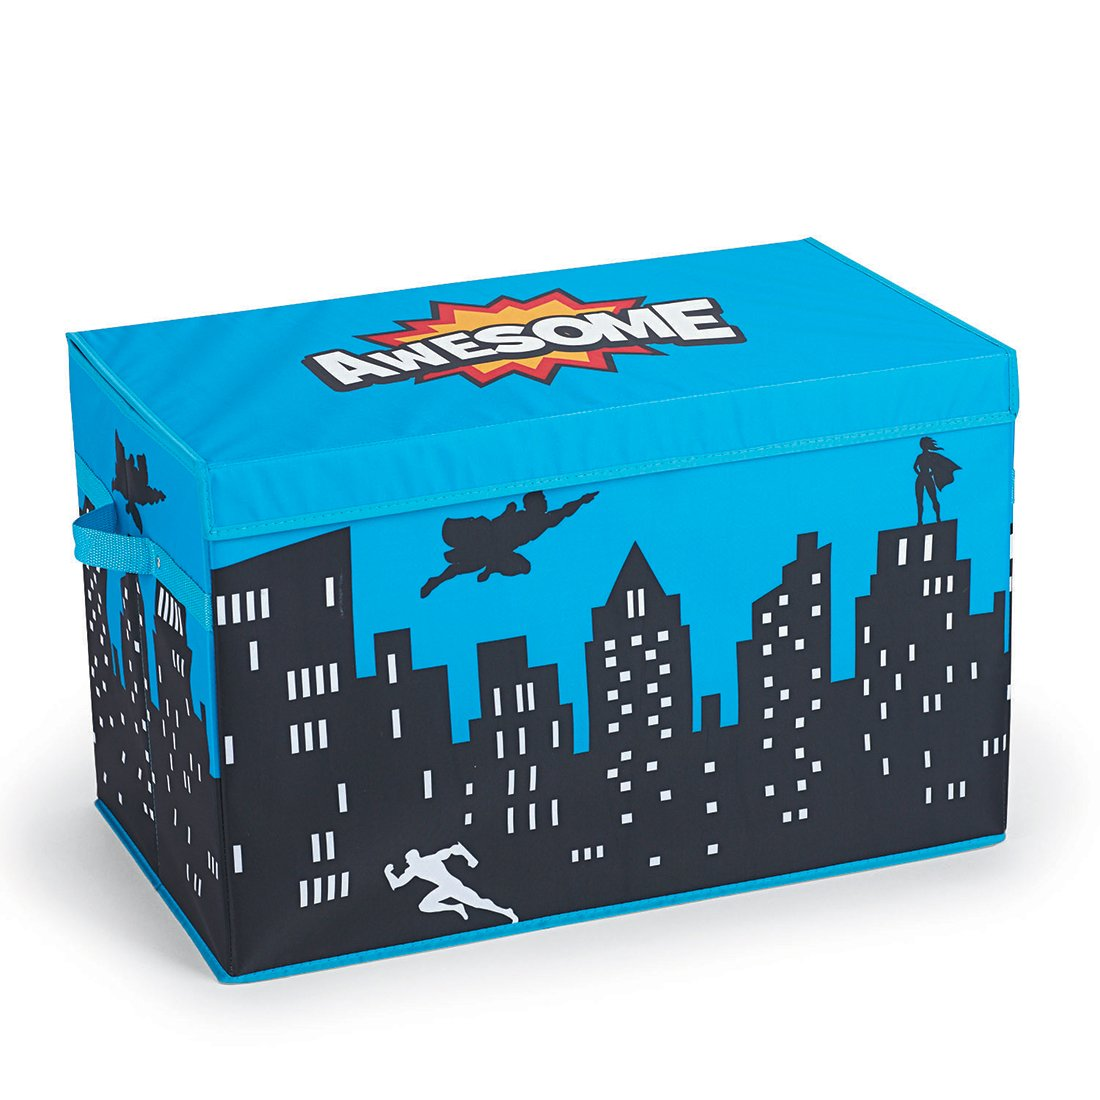 Superhero Reward Chest - Classroom Organisers Fun365